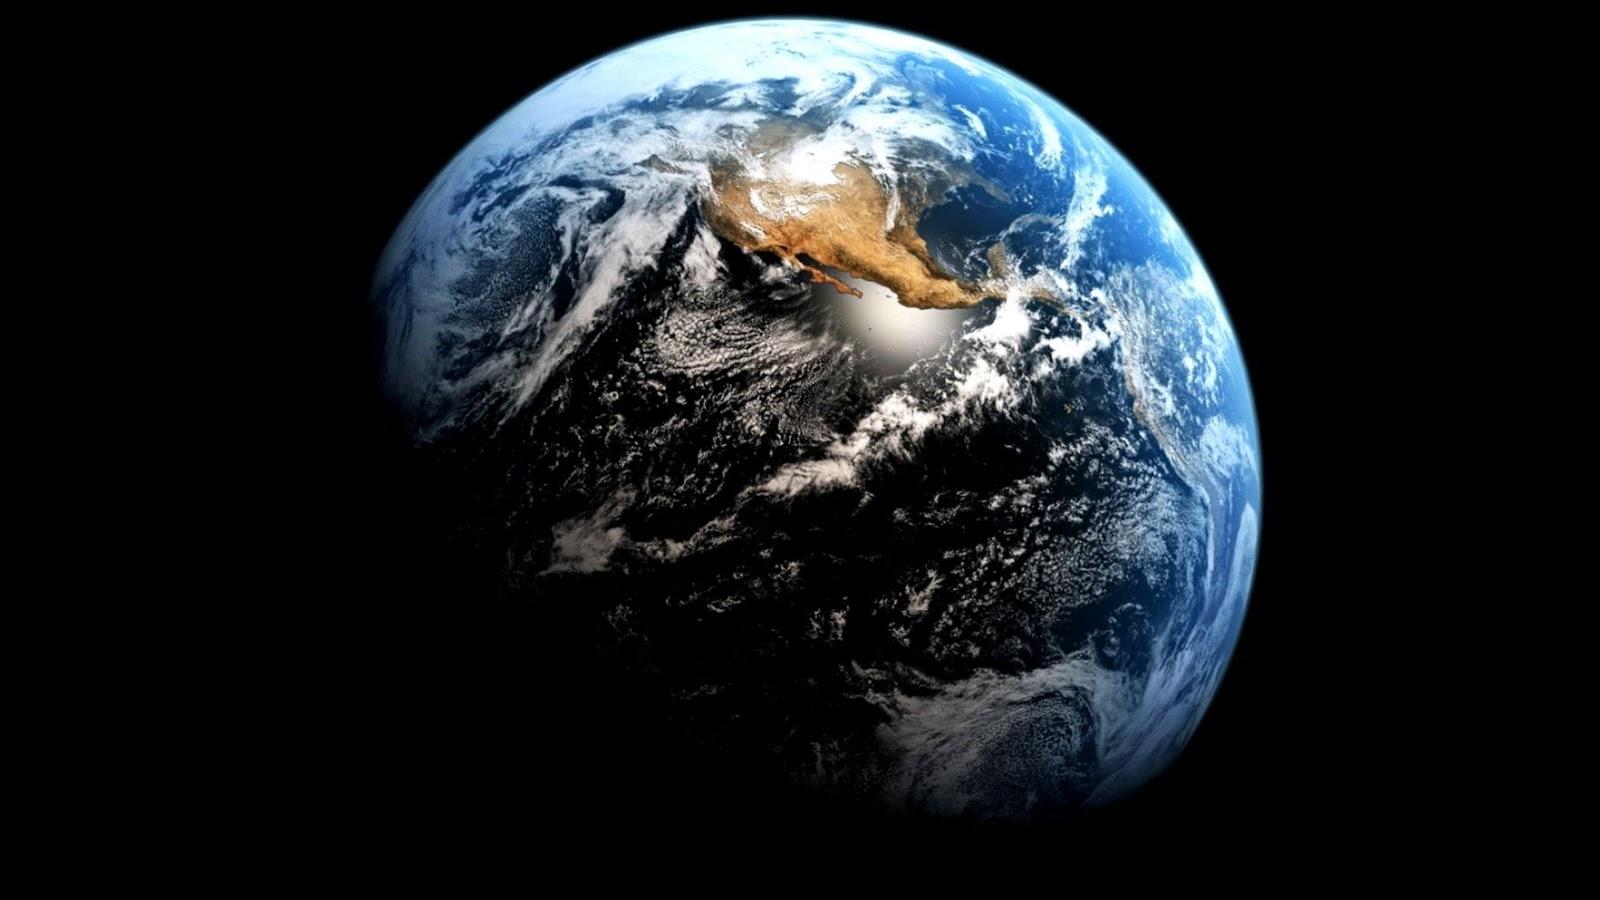 Earth From Space Wallpaper 1920x1080 Hd Wallpaper For Desktop